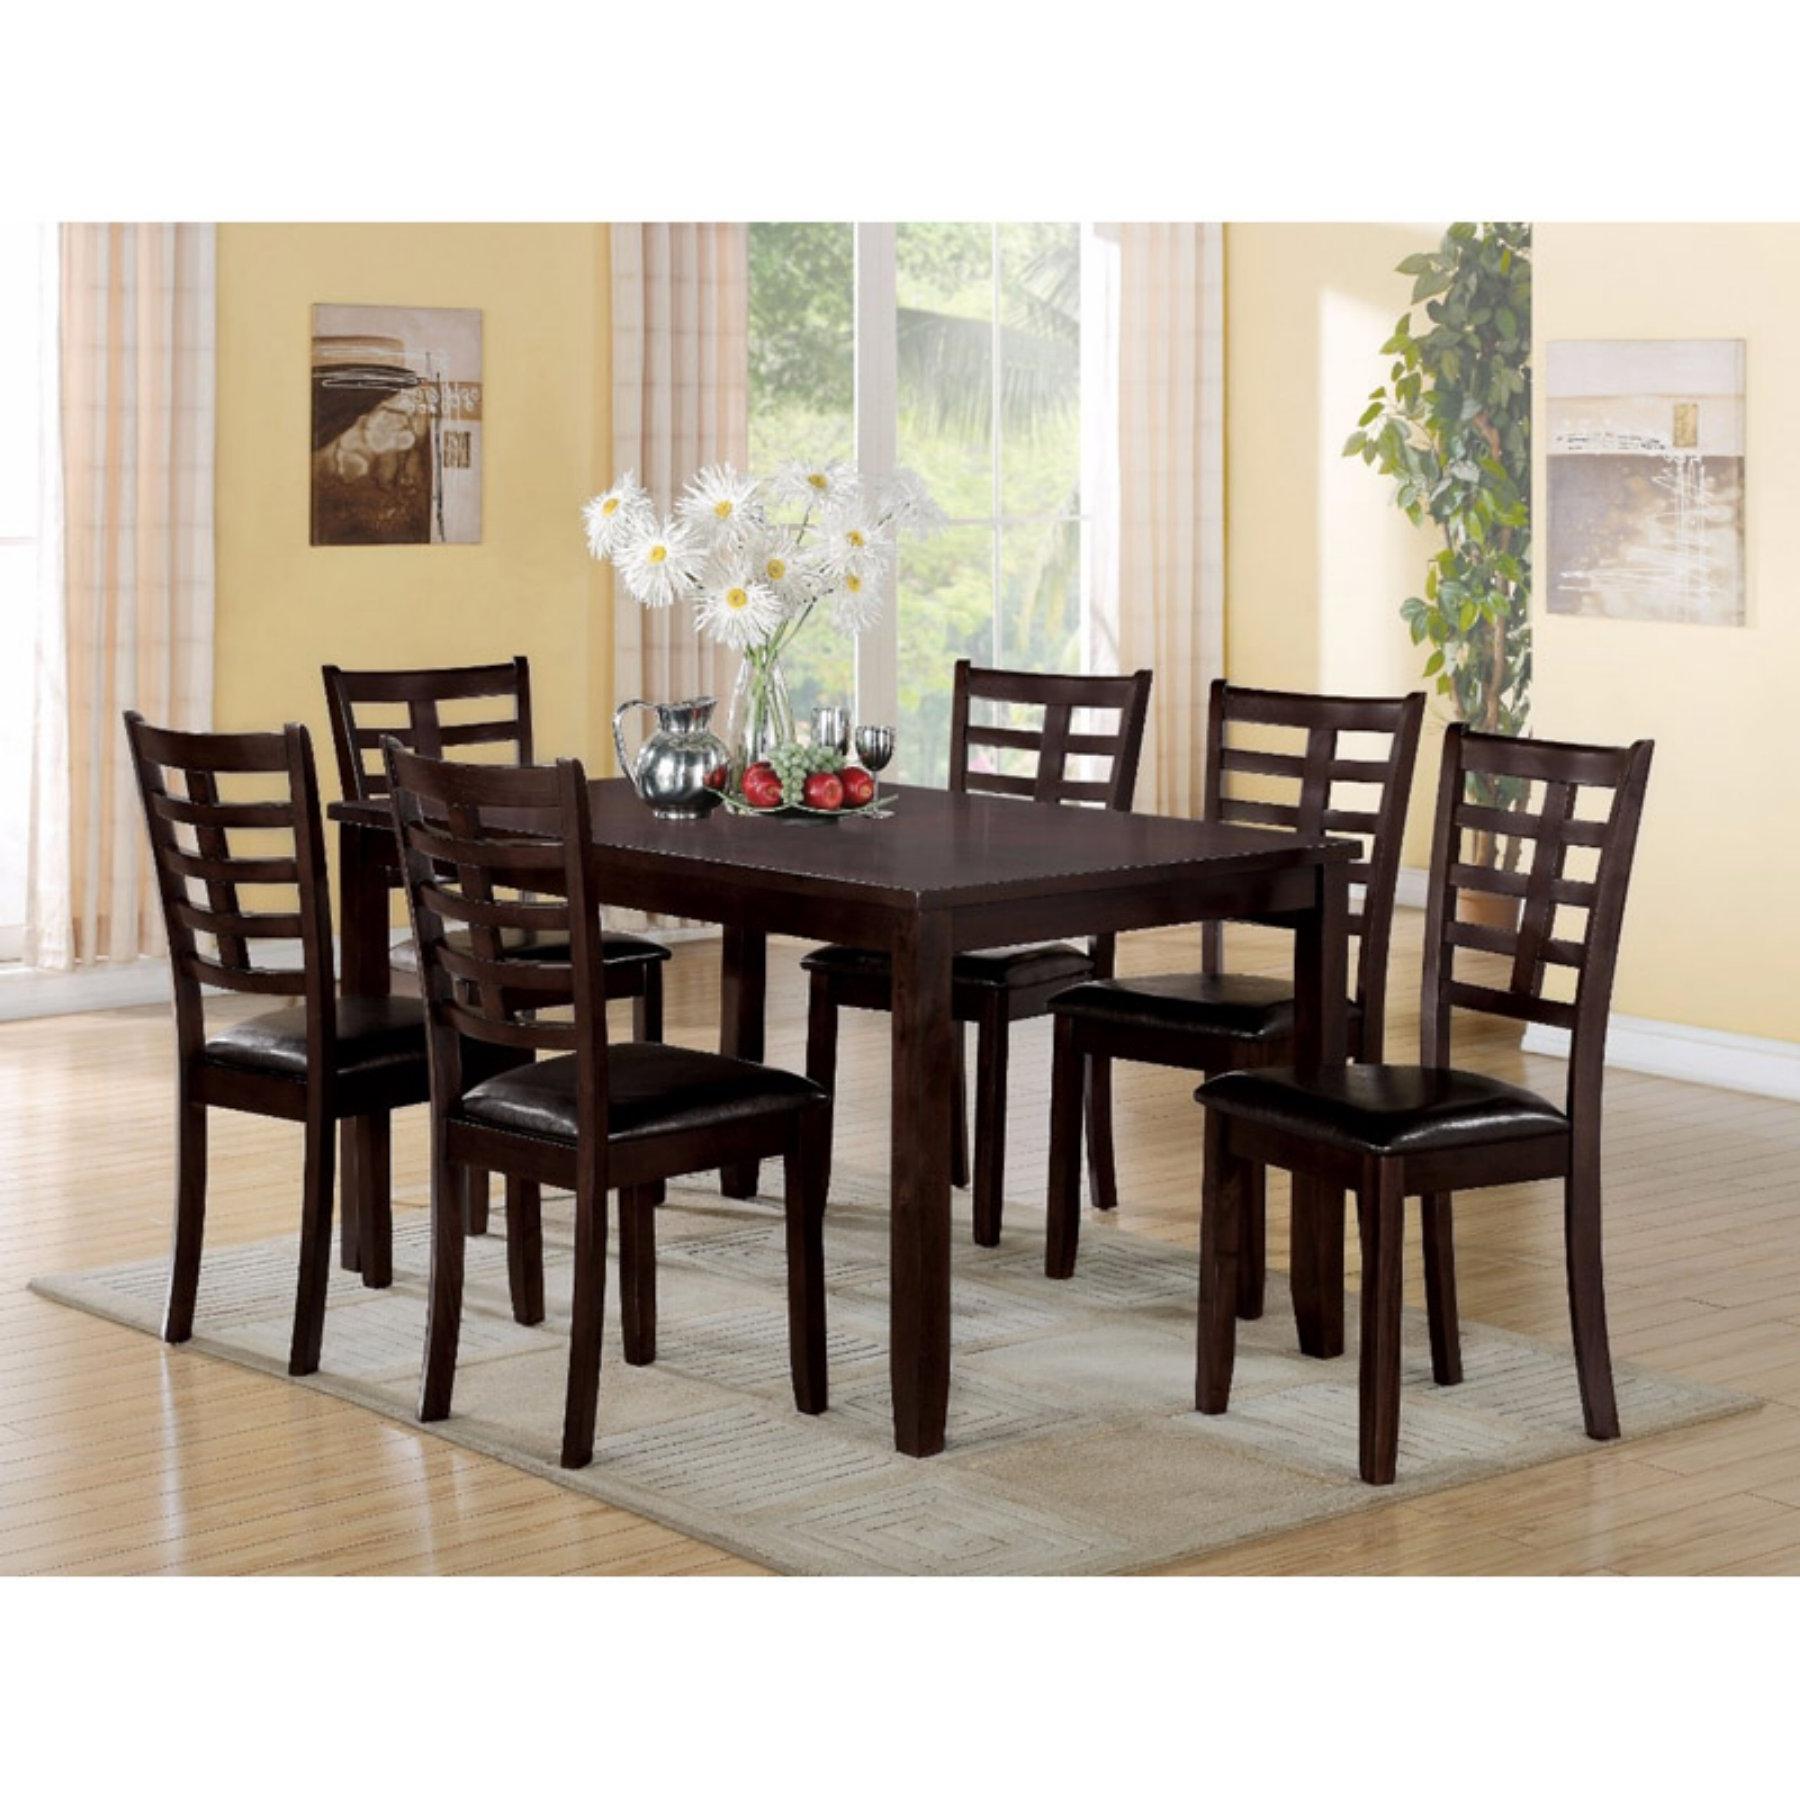 Favorite Benzara Wooden 7 Piece Rectangular Dining Table Set In 2018 Regarding Market 7 Piece Counter Sets (View 8 of 25)